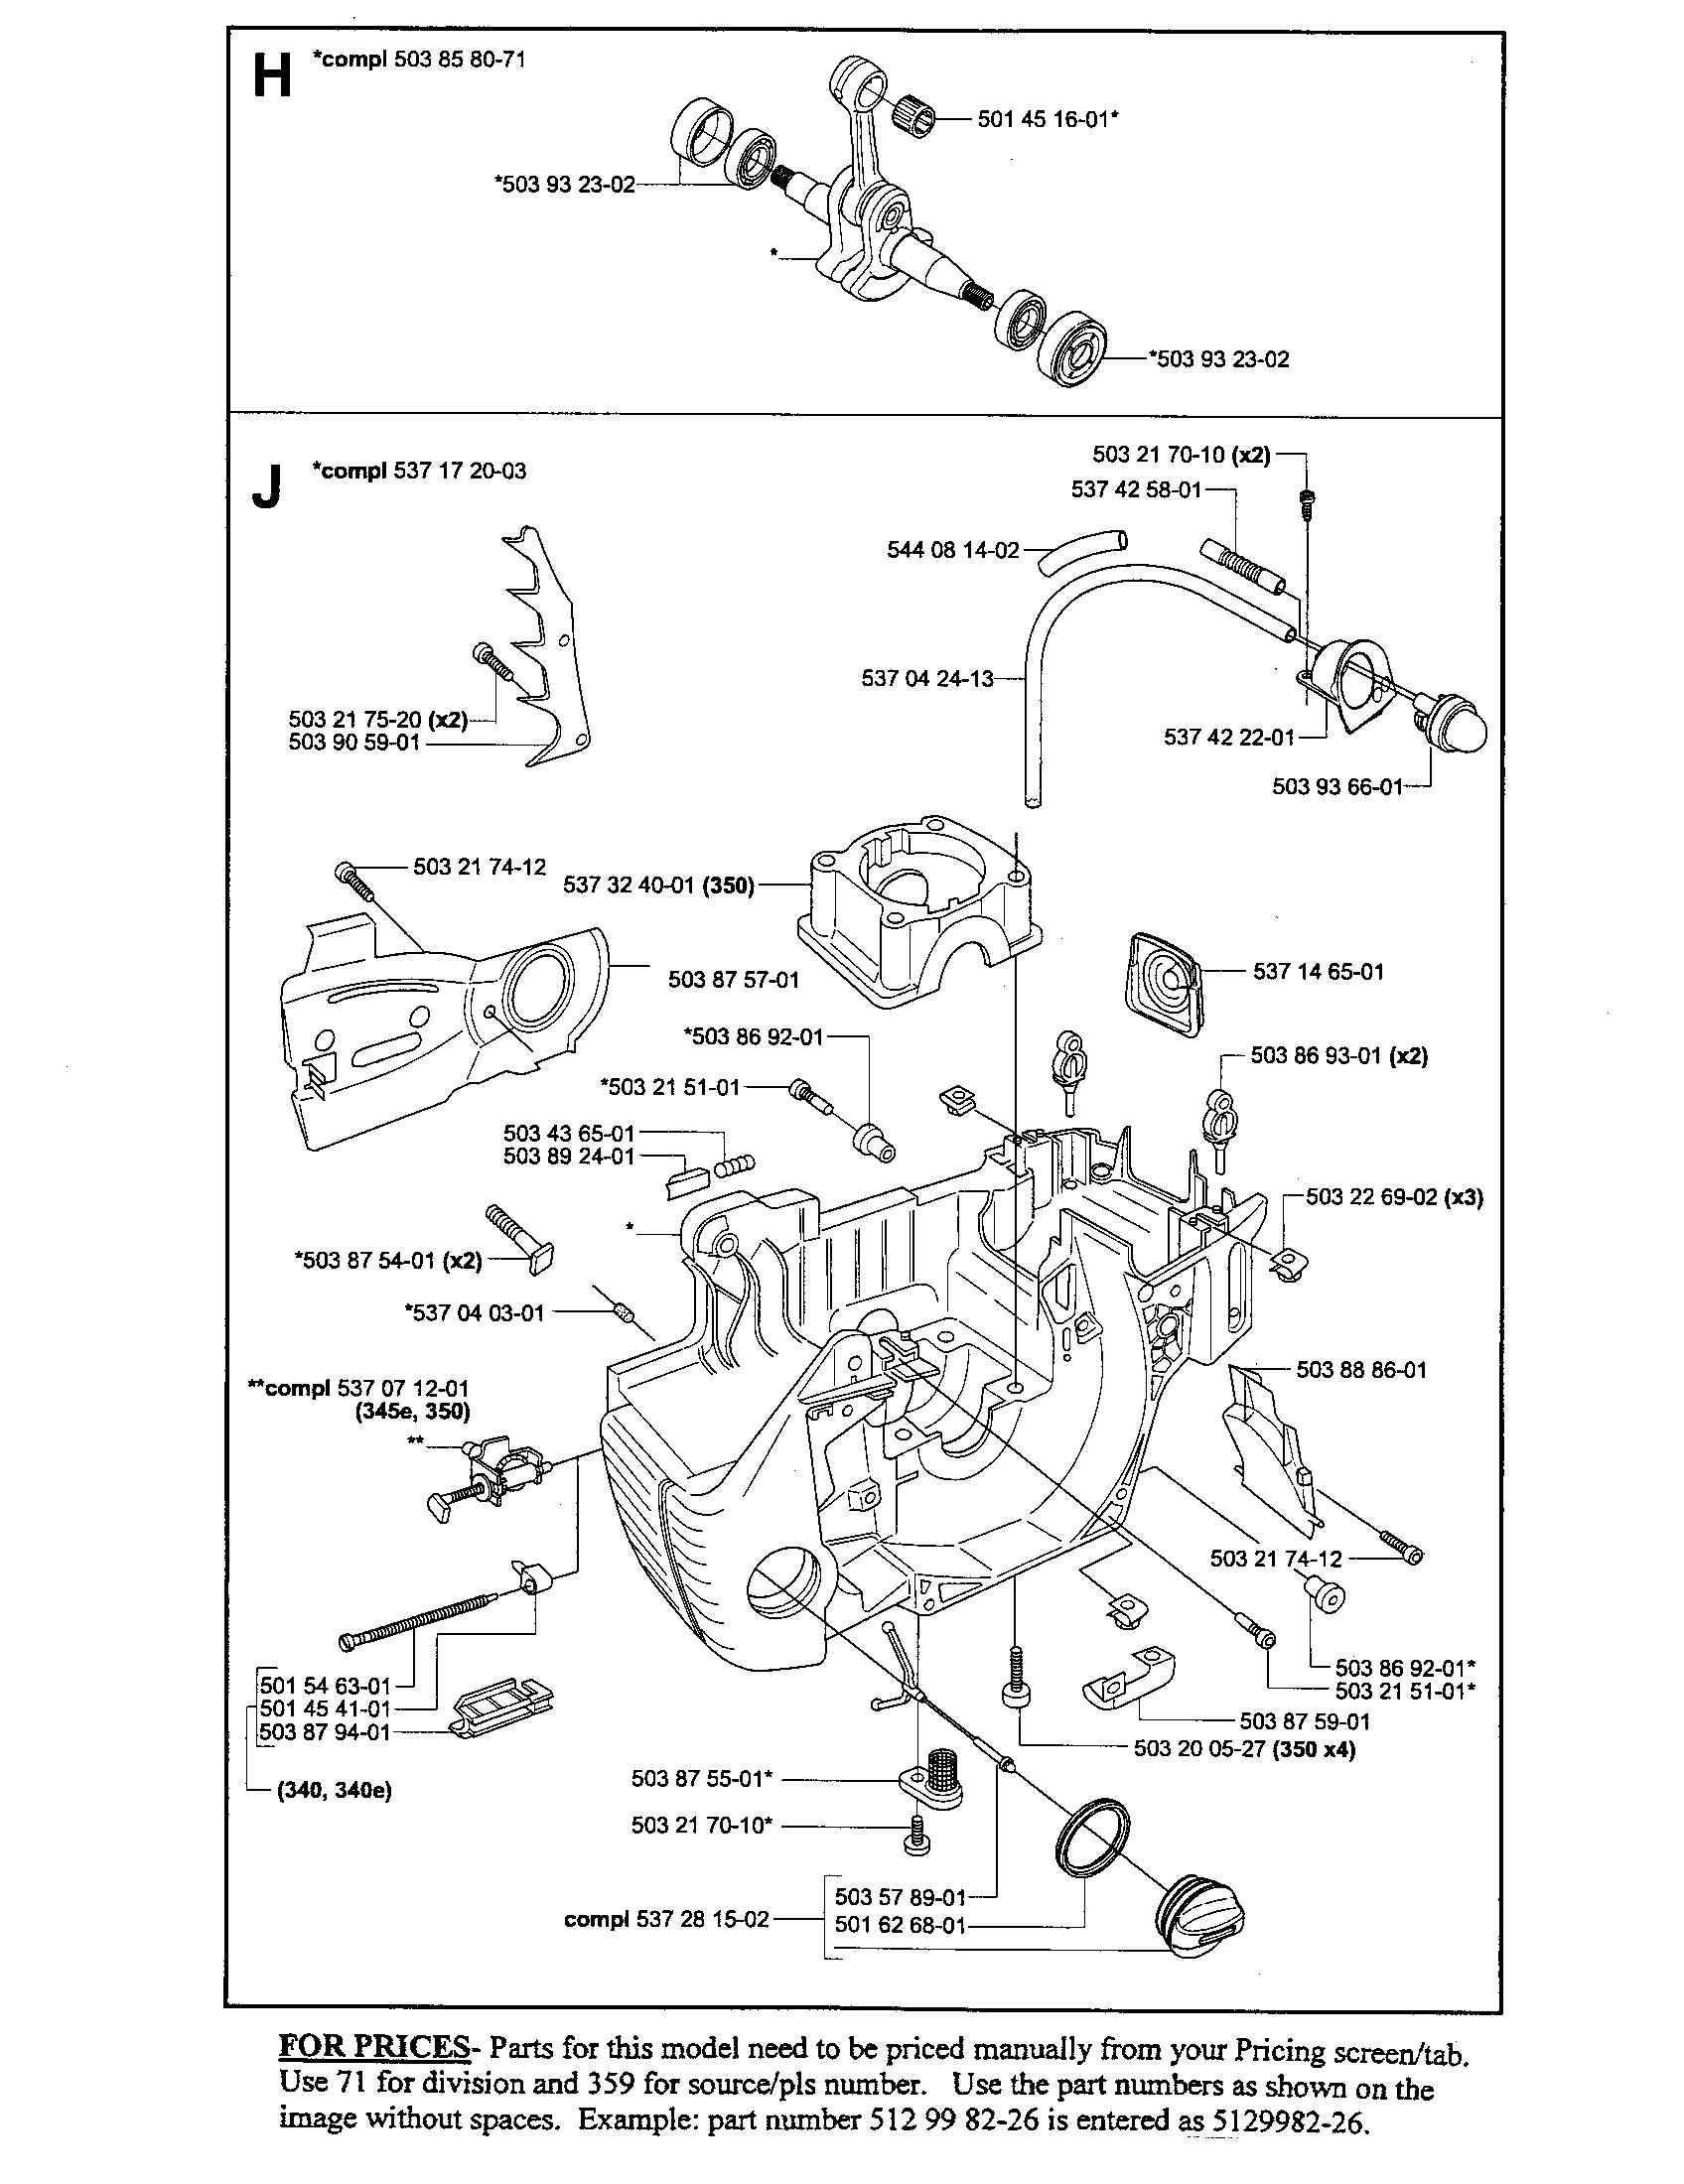 Husqvarna model 340 chainsaw, gas genuine parts